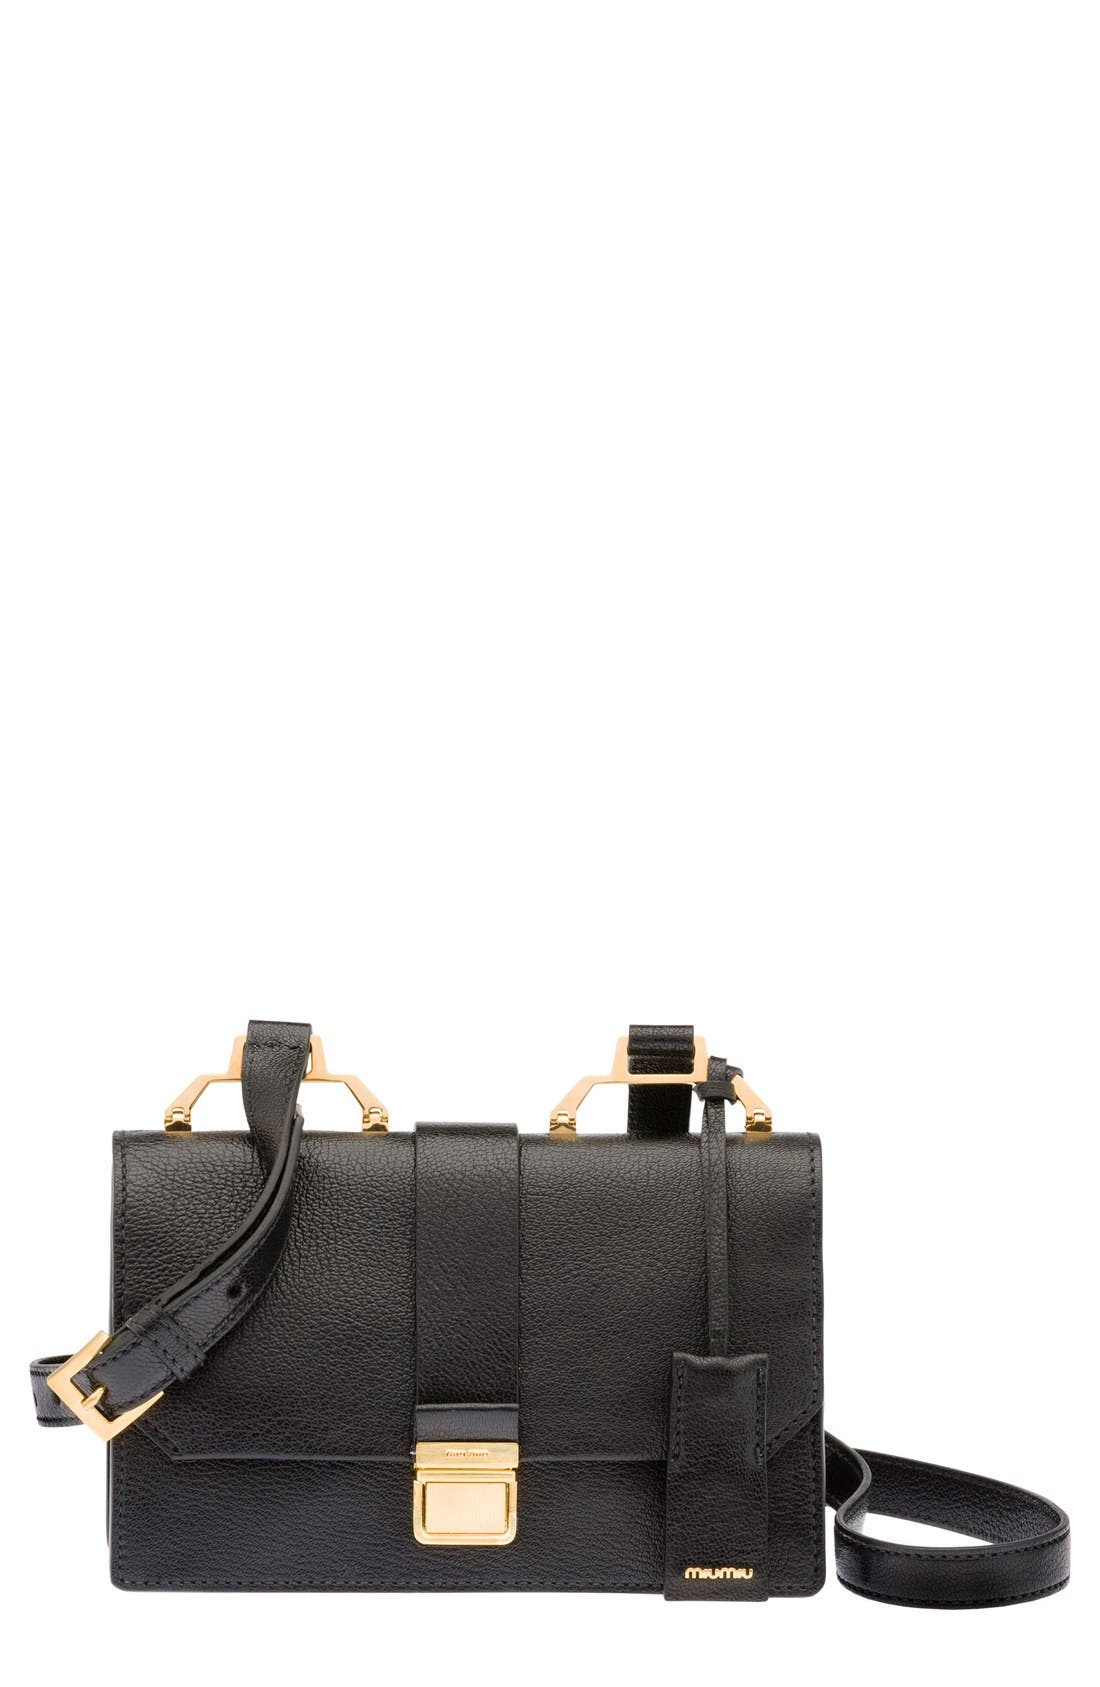 MIU MIU Small Madras Goatskin Leather Shoulder Bag